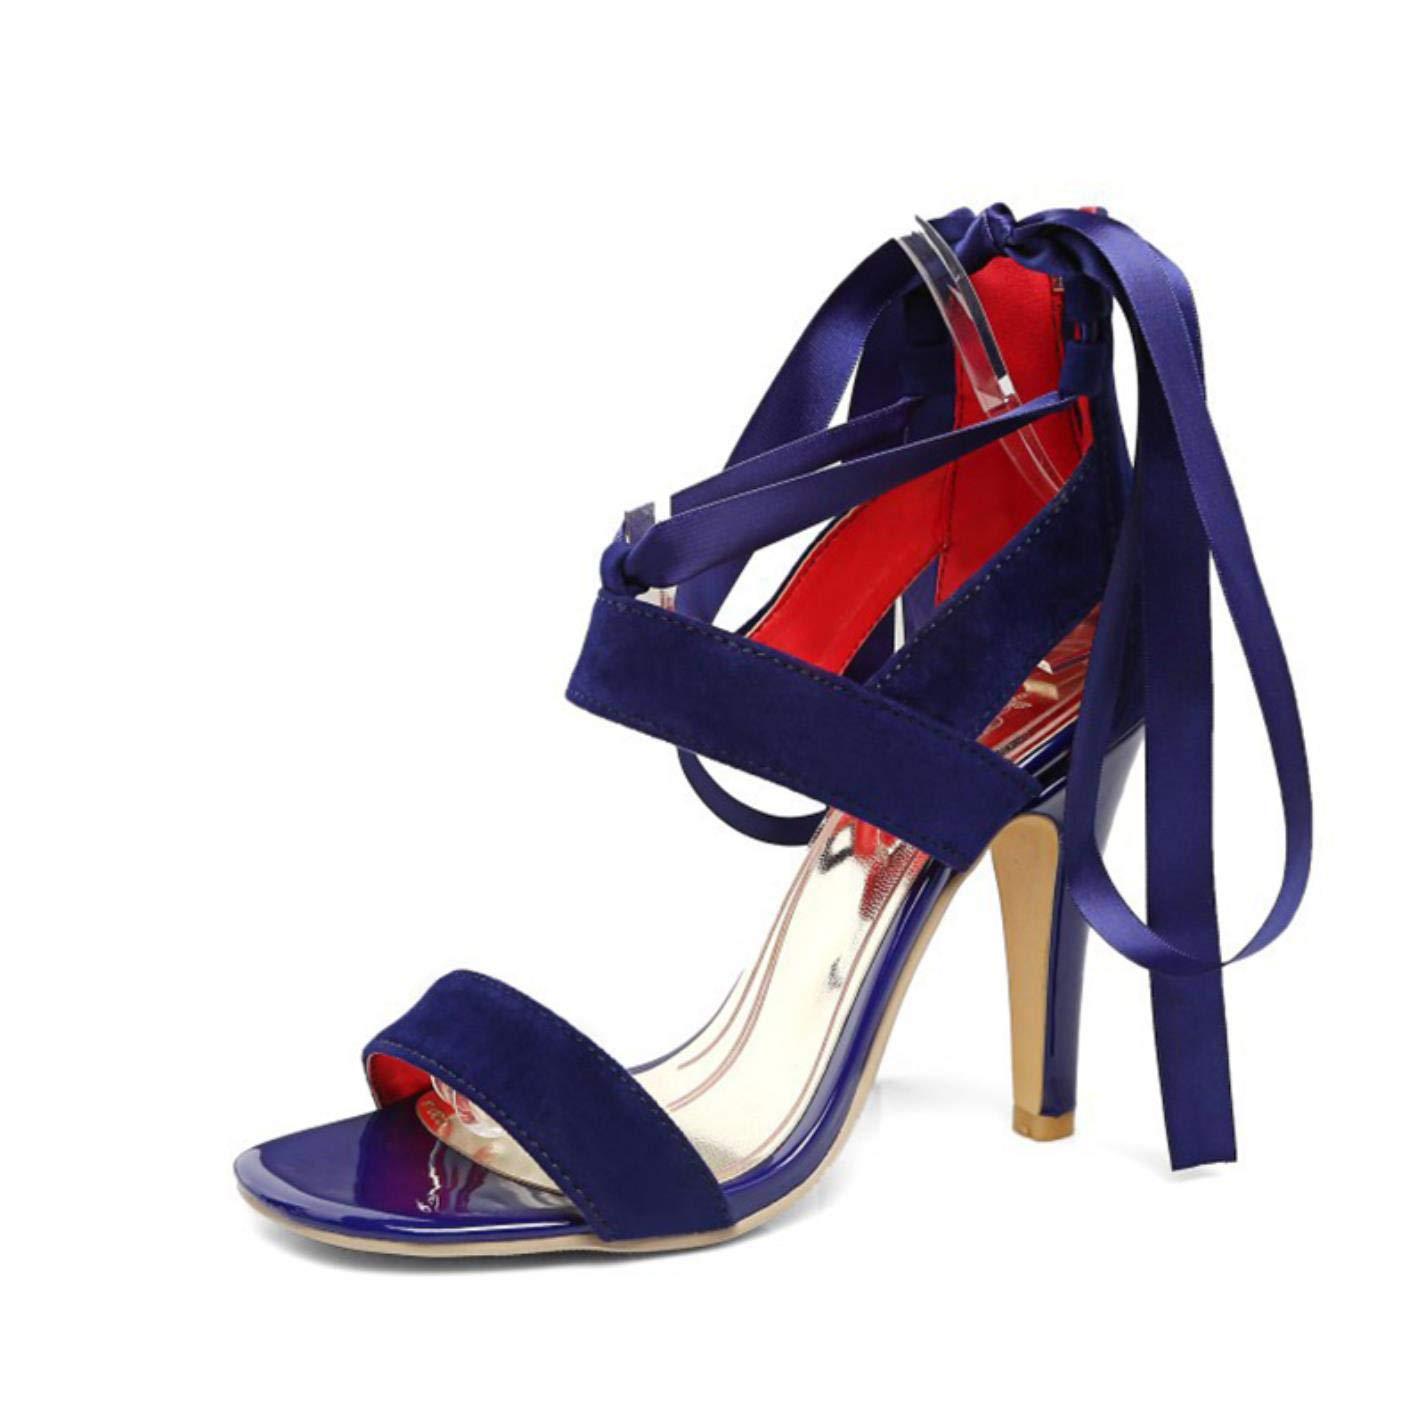 Women Sandals Summer Peep Toe Ankle Strap High Heels